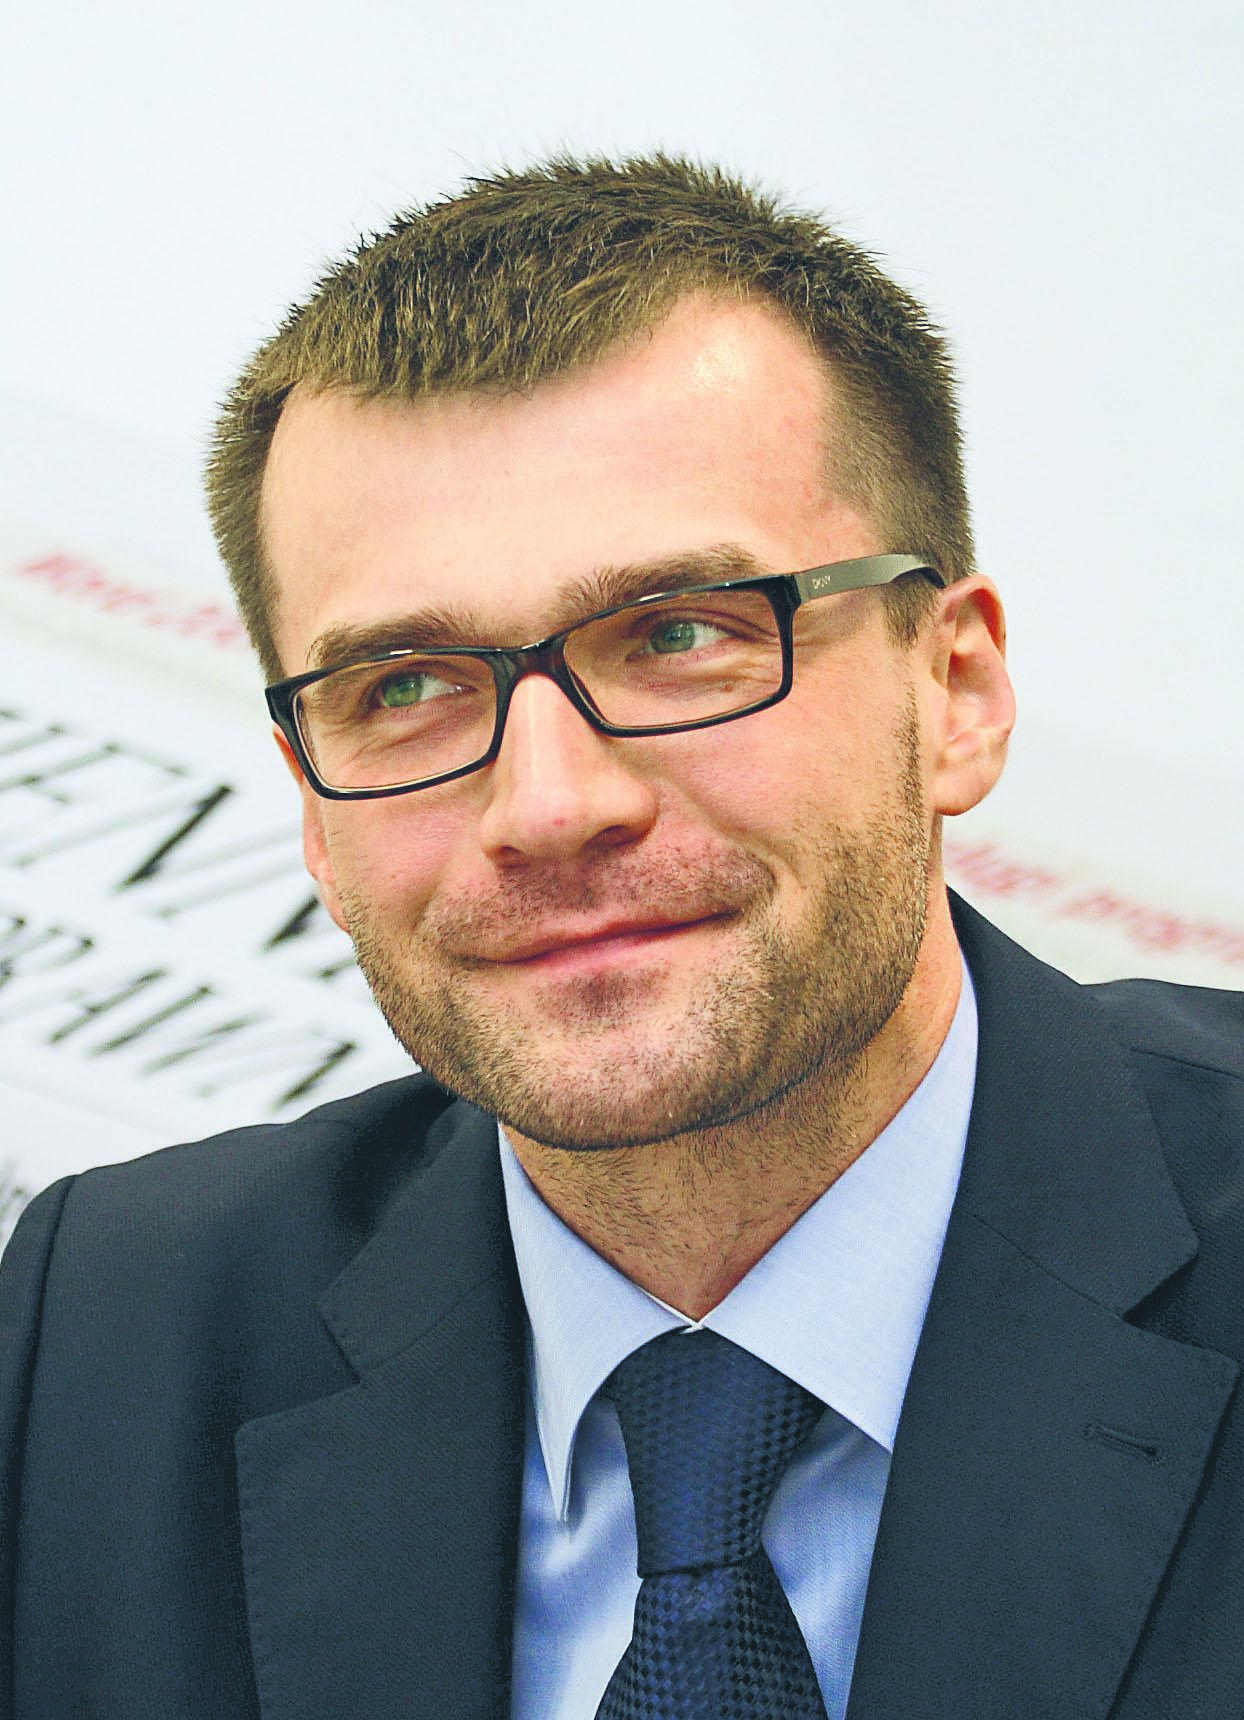 Michał Kanownik